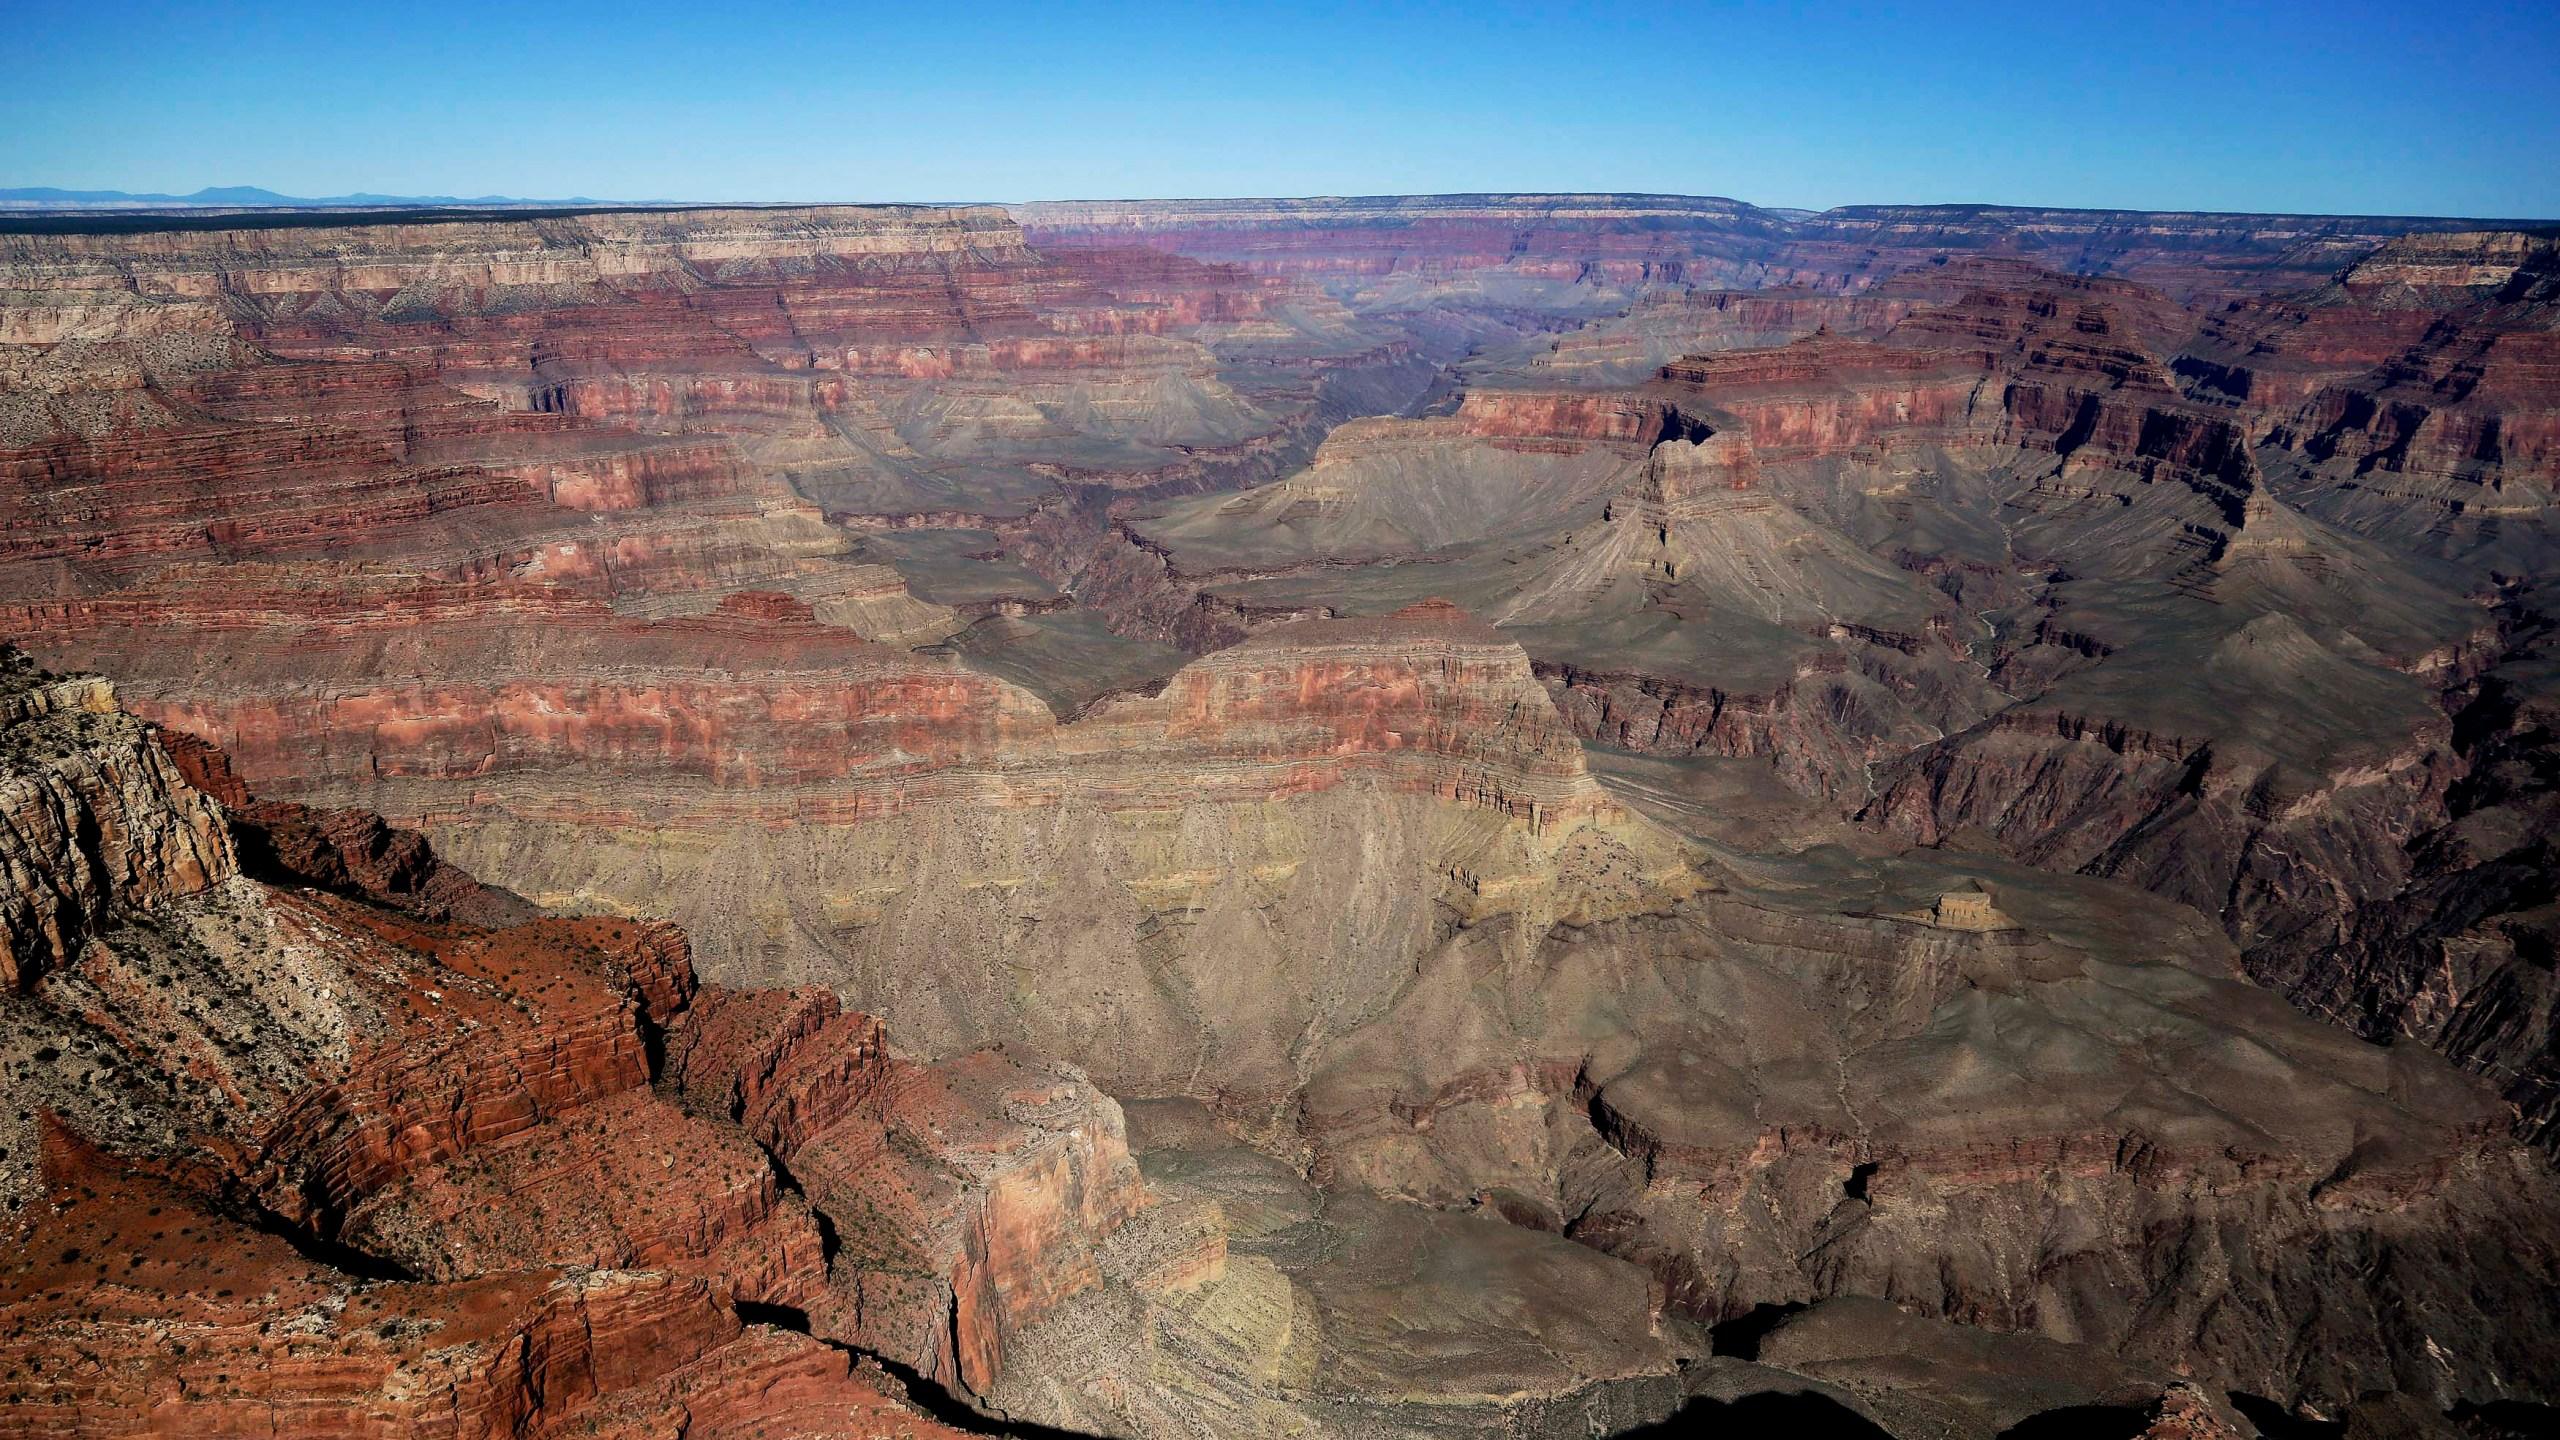 Grand_Canyon_Superintendent_47552-159532.jpg02665309